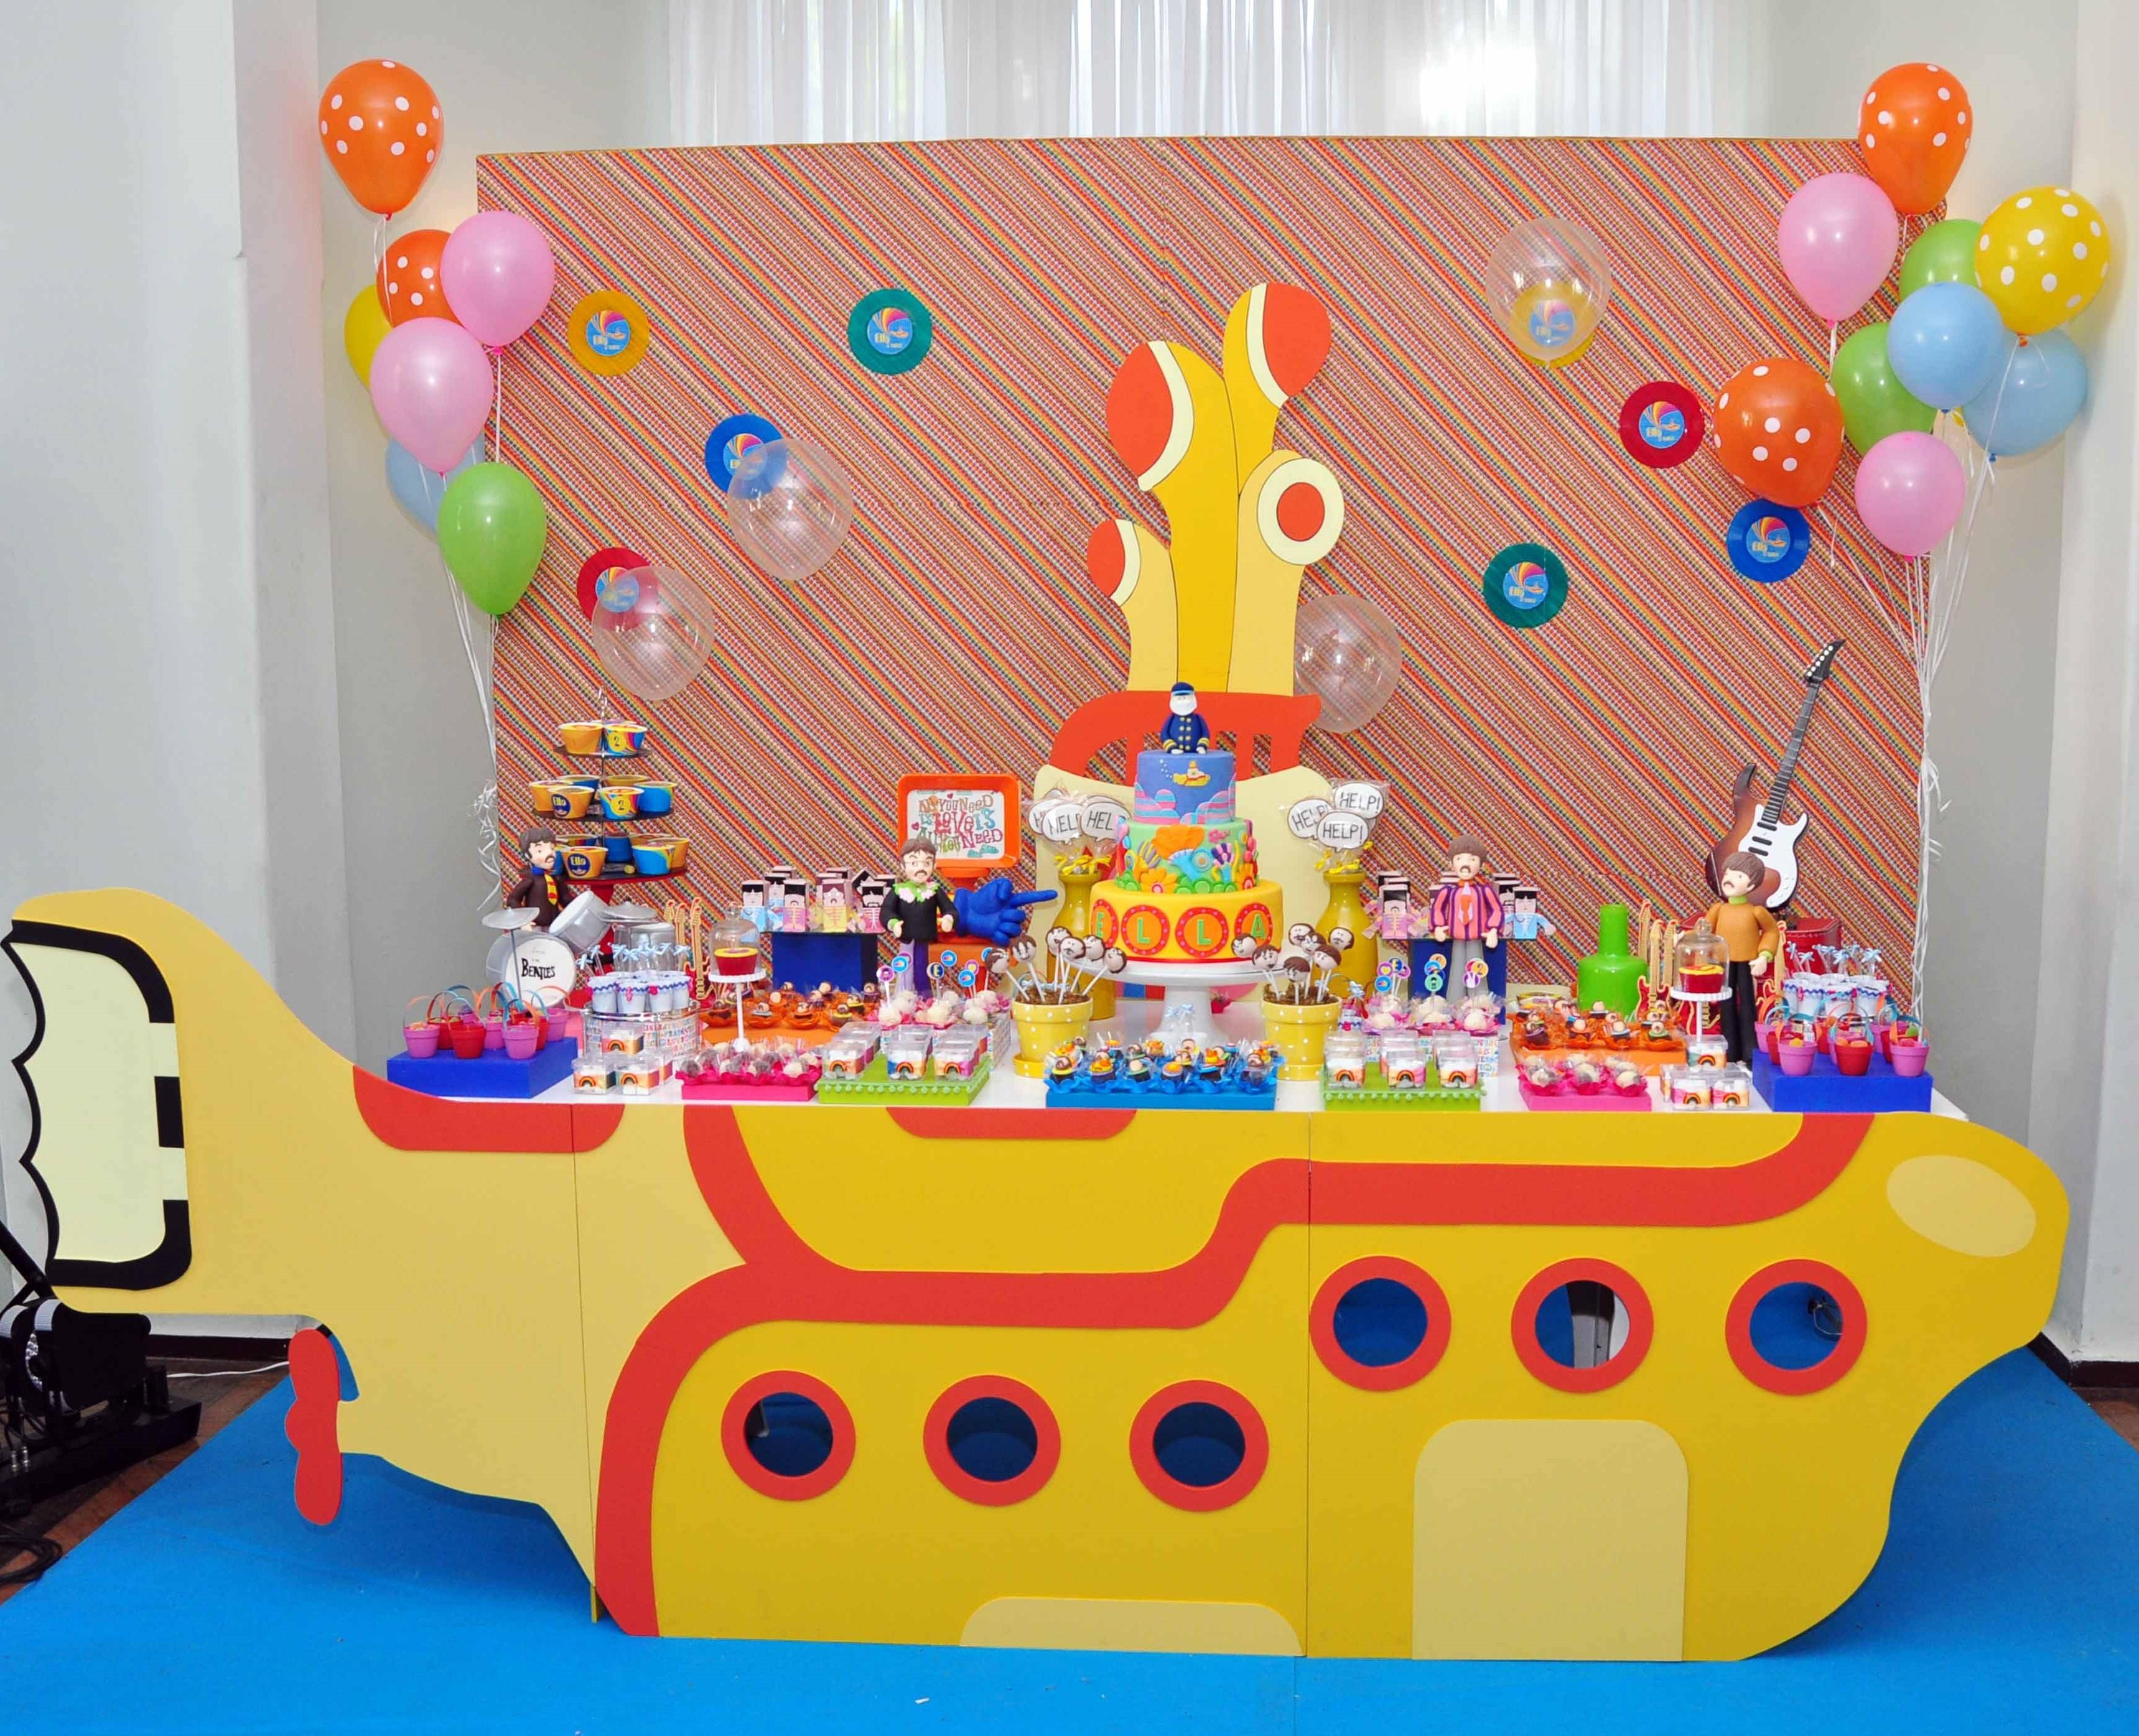 decoracao festa infantil yellow submarine:festa submarine festa submarine festa submarine festa personalizada